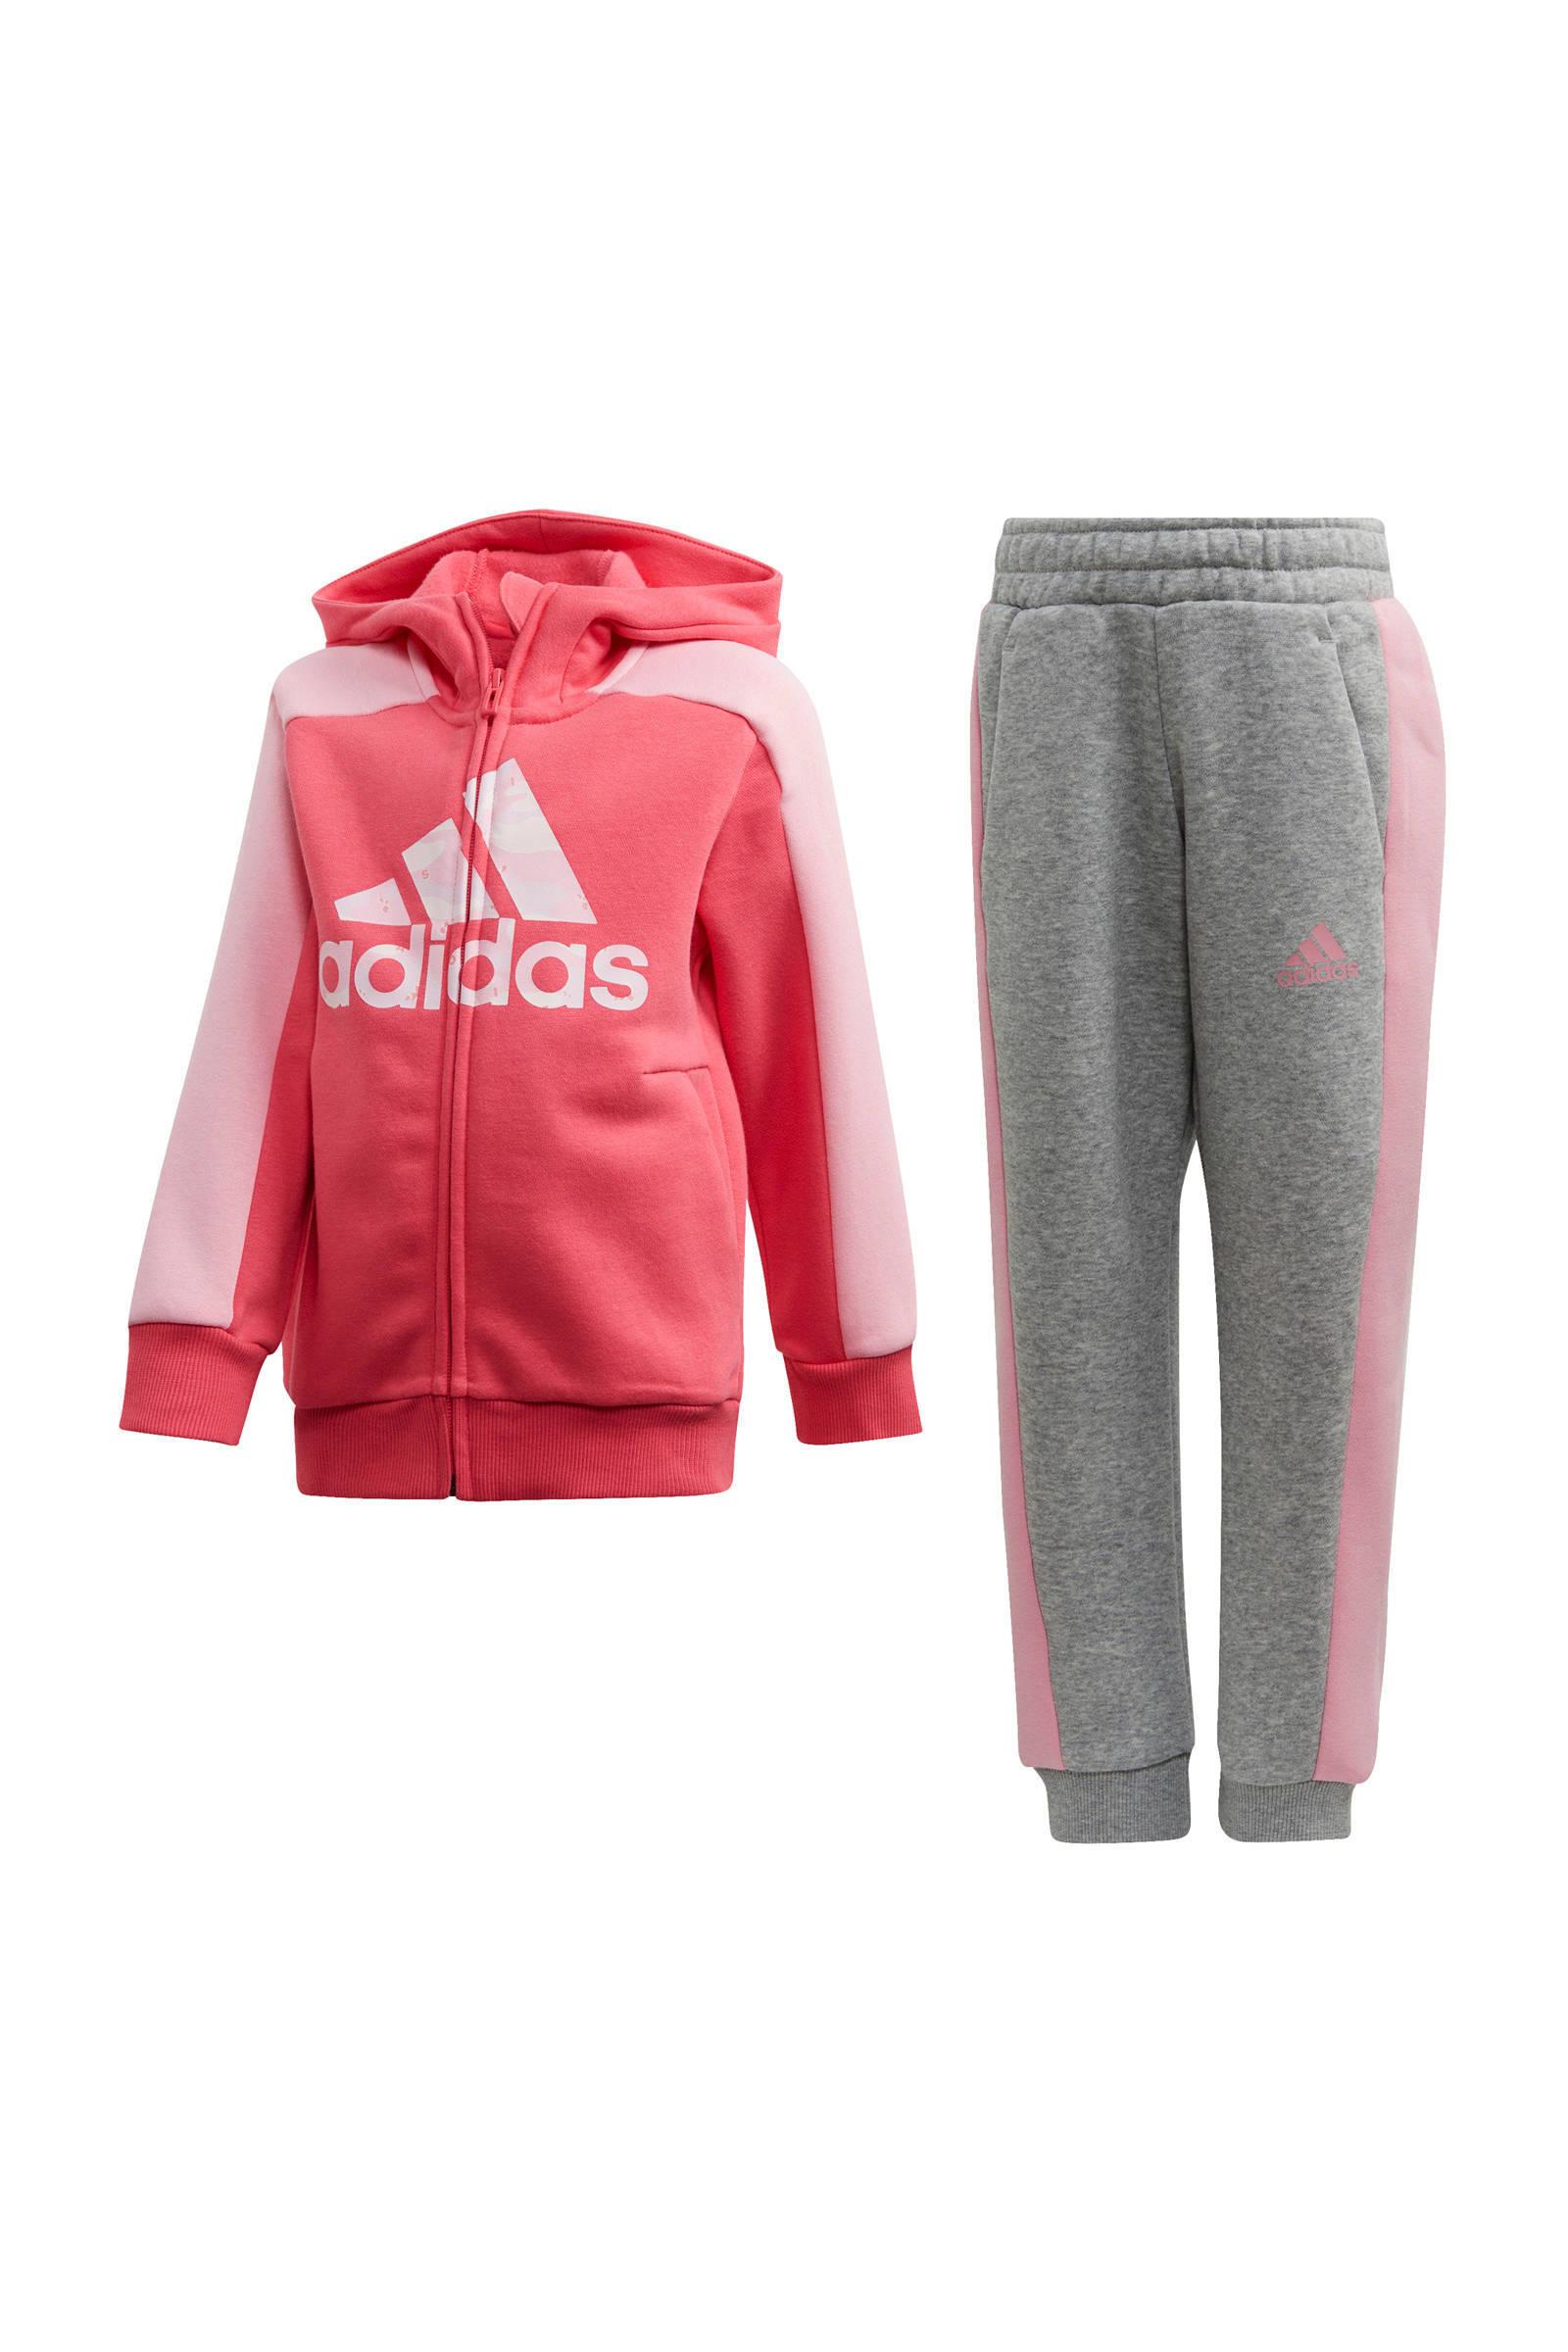 adidas Performance joggingpak rozegrijs   wehkamp